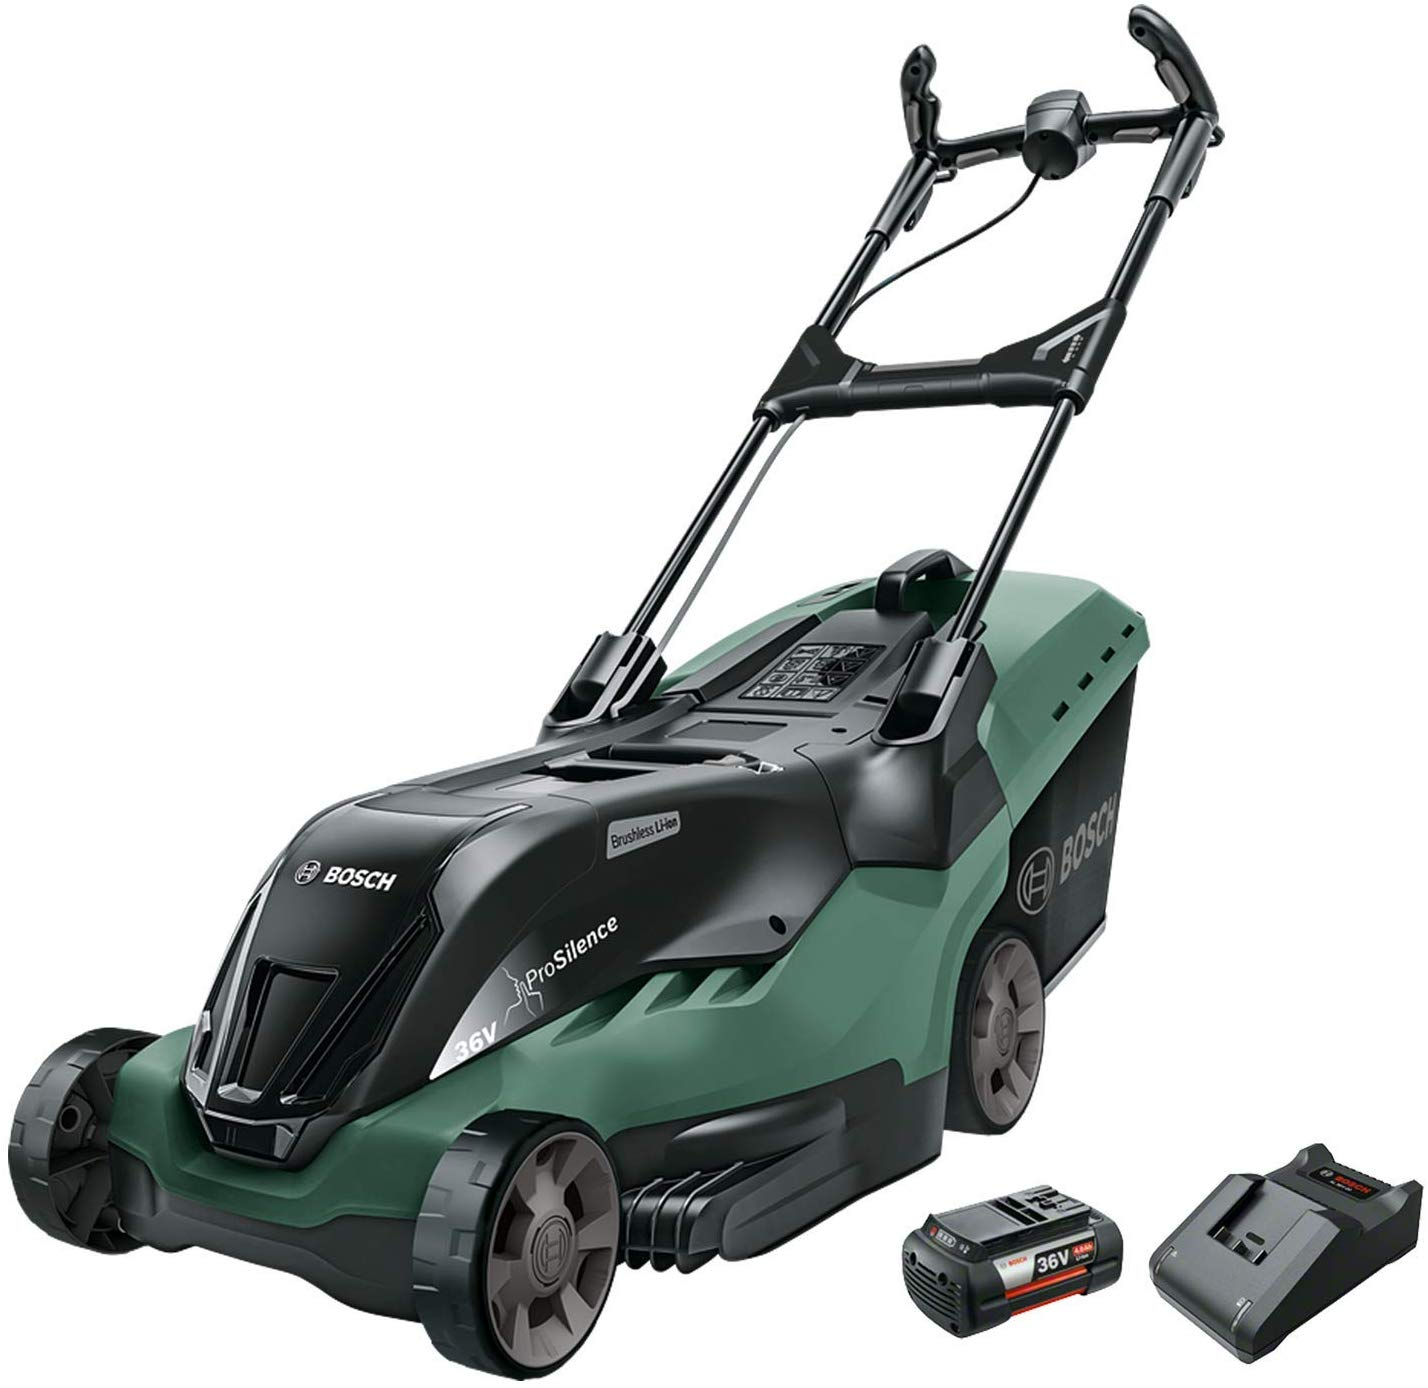 Bosch - Rotak 750 LI Hochleistungs-Akku-Rasenmäher (Akku und Ladegerät enthalten)